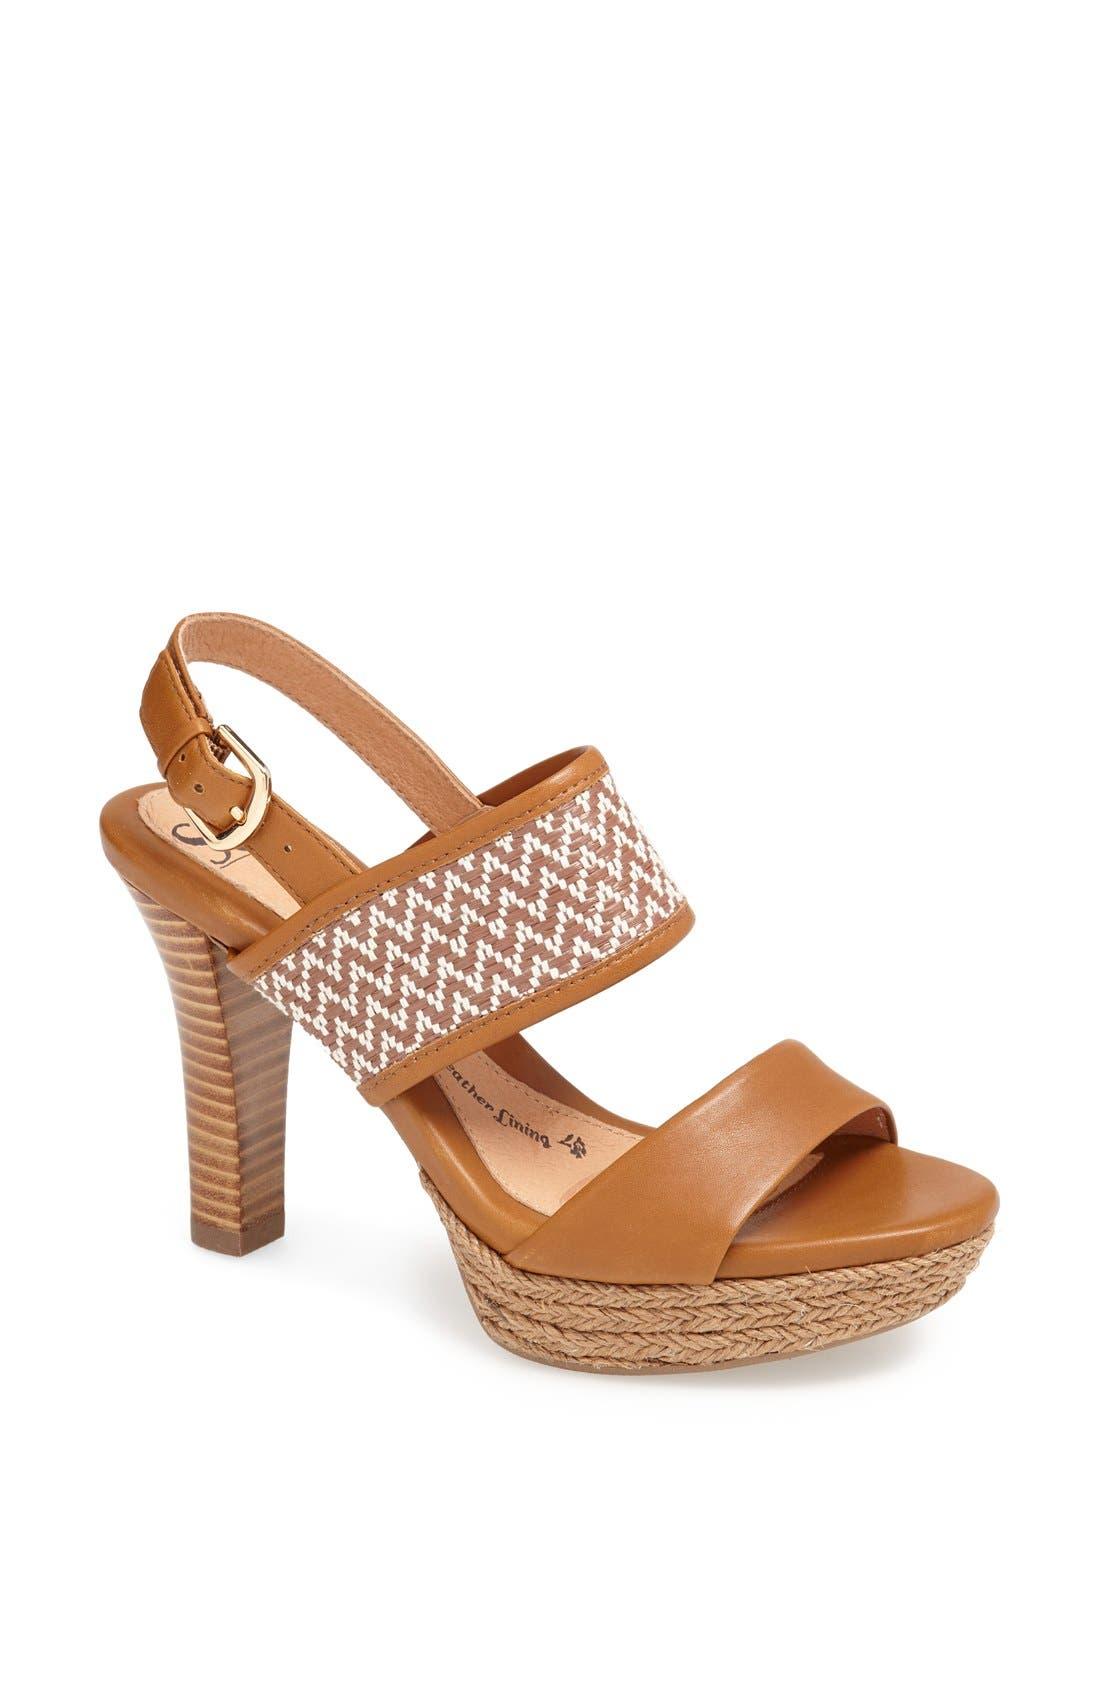 Alternate Image 1 Selected - Söfft 'Sarita' Platform Sandal